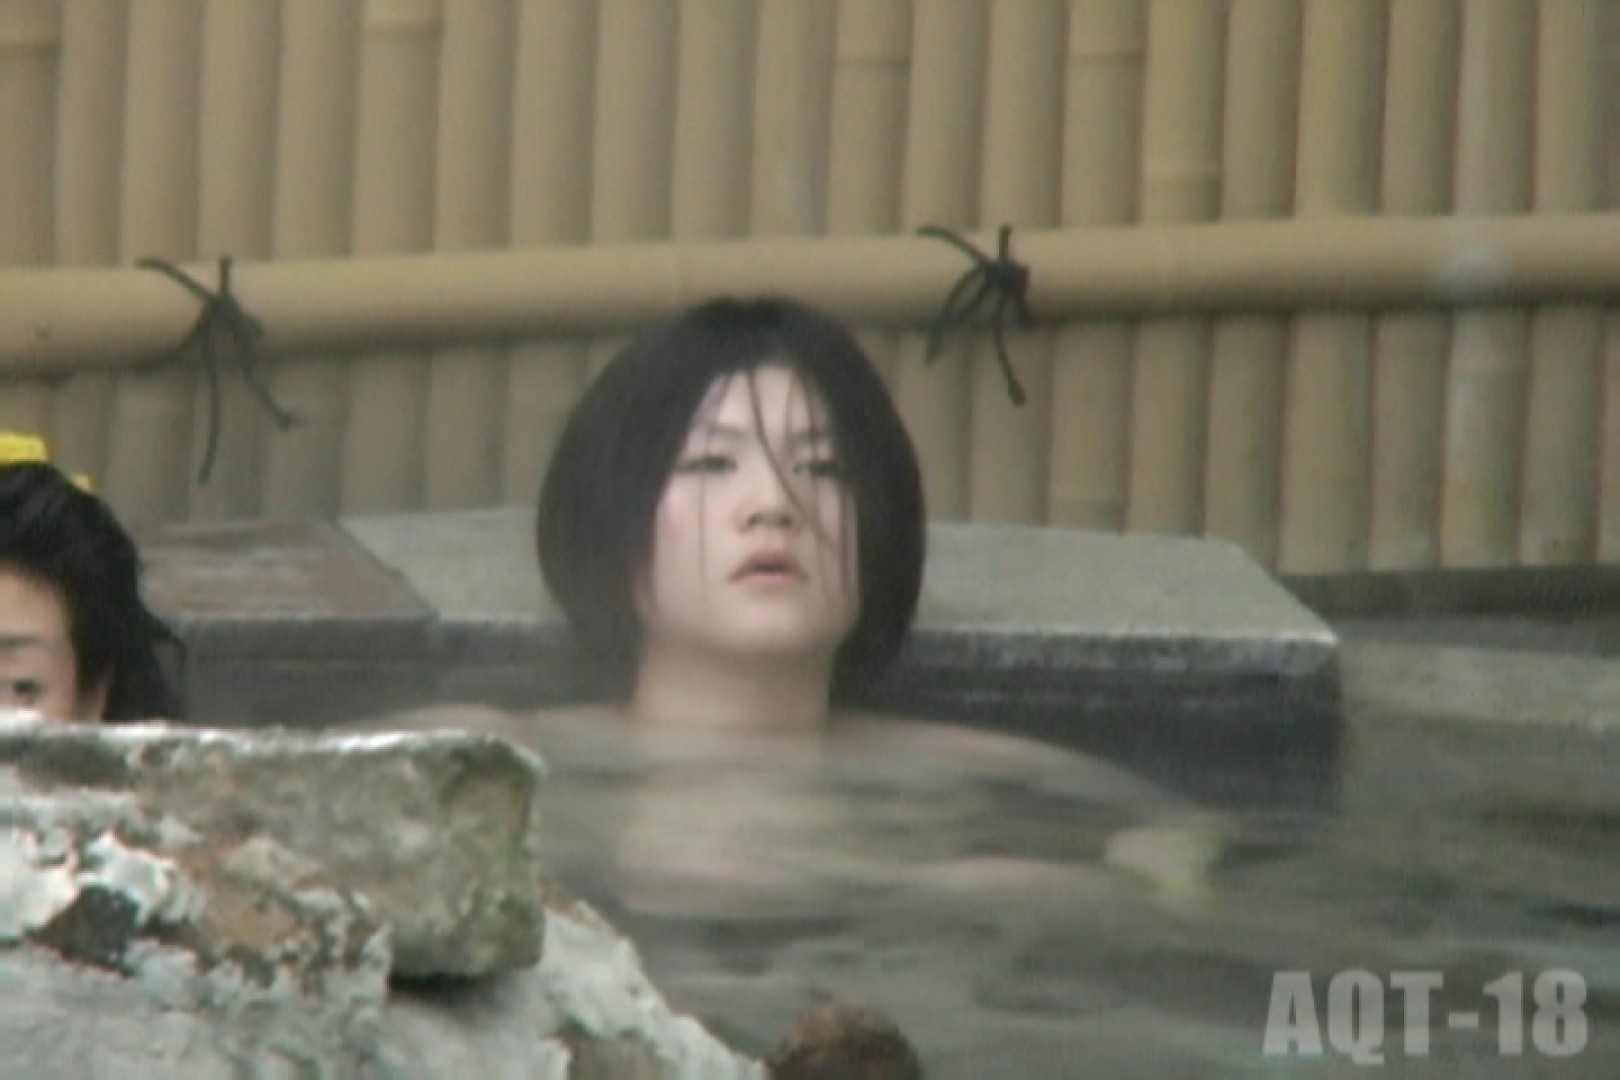 Aquaな露天風呂Vol.859 露天風呂編  76PIX 12